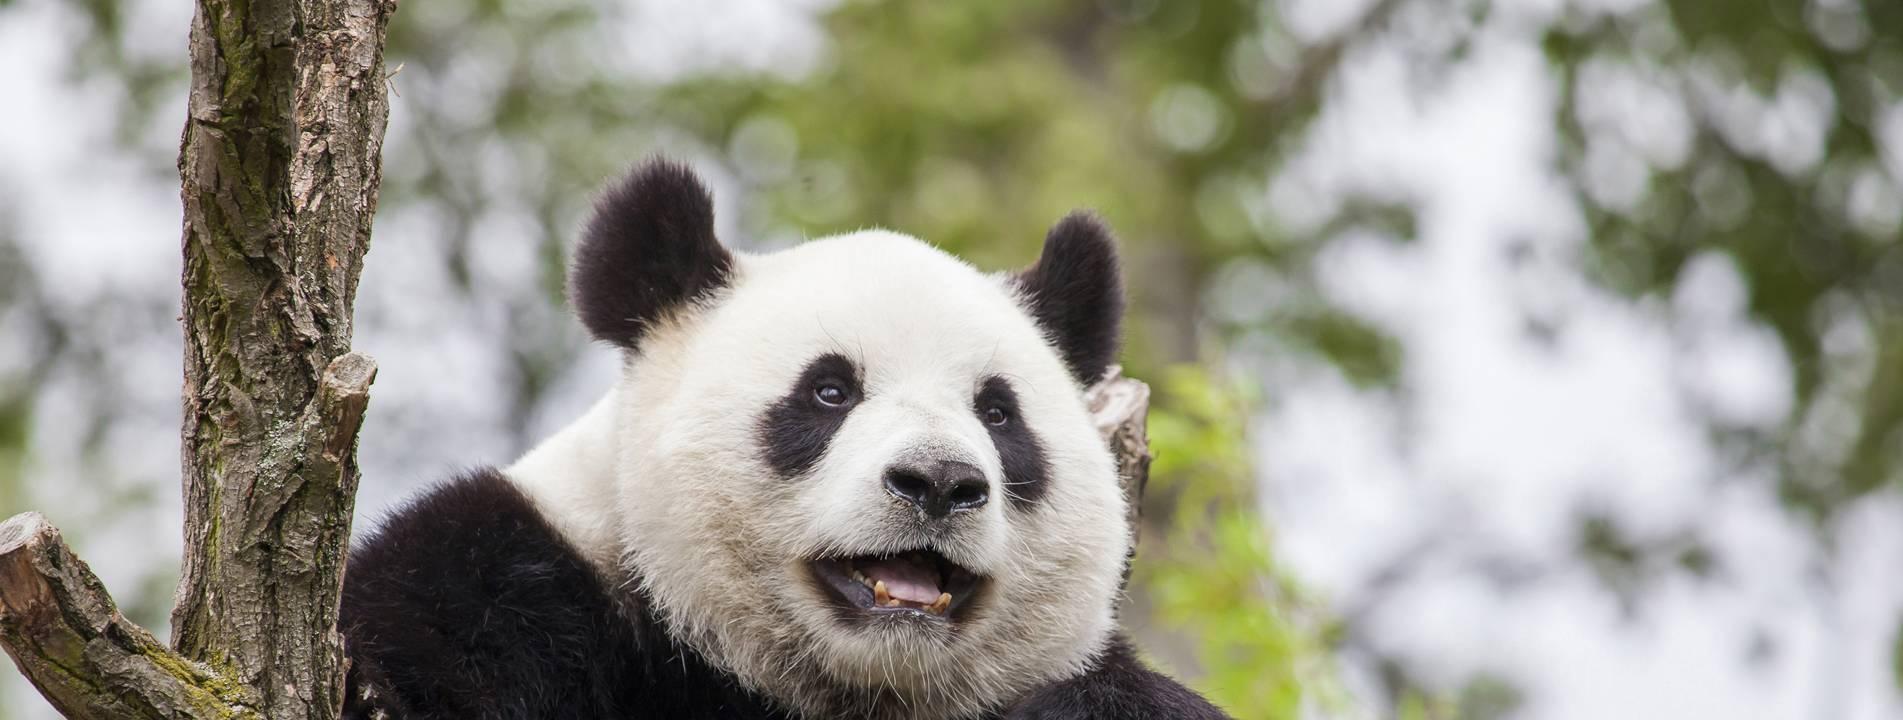 Panda tours 2015